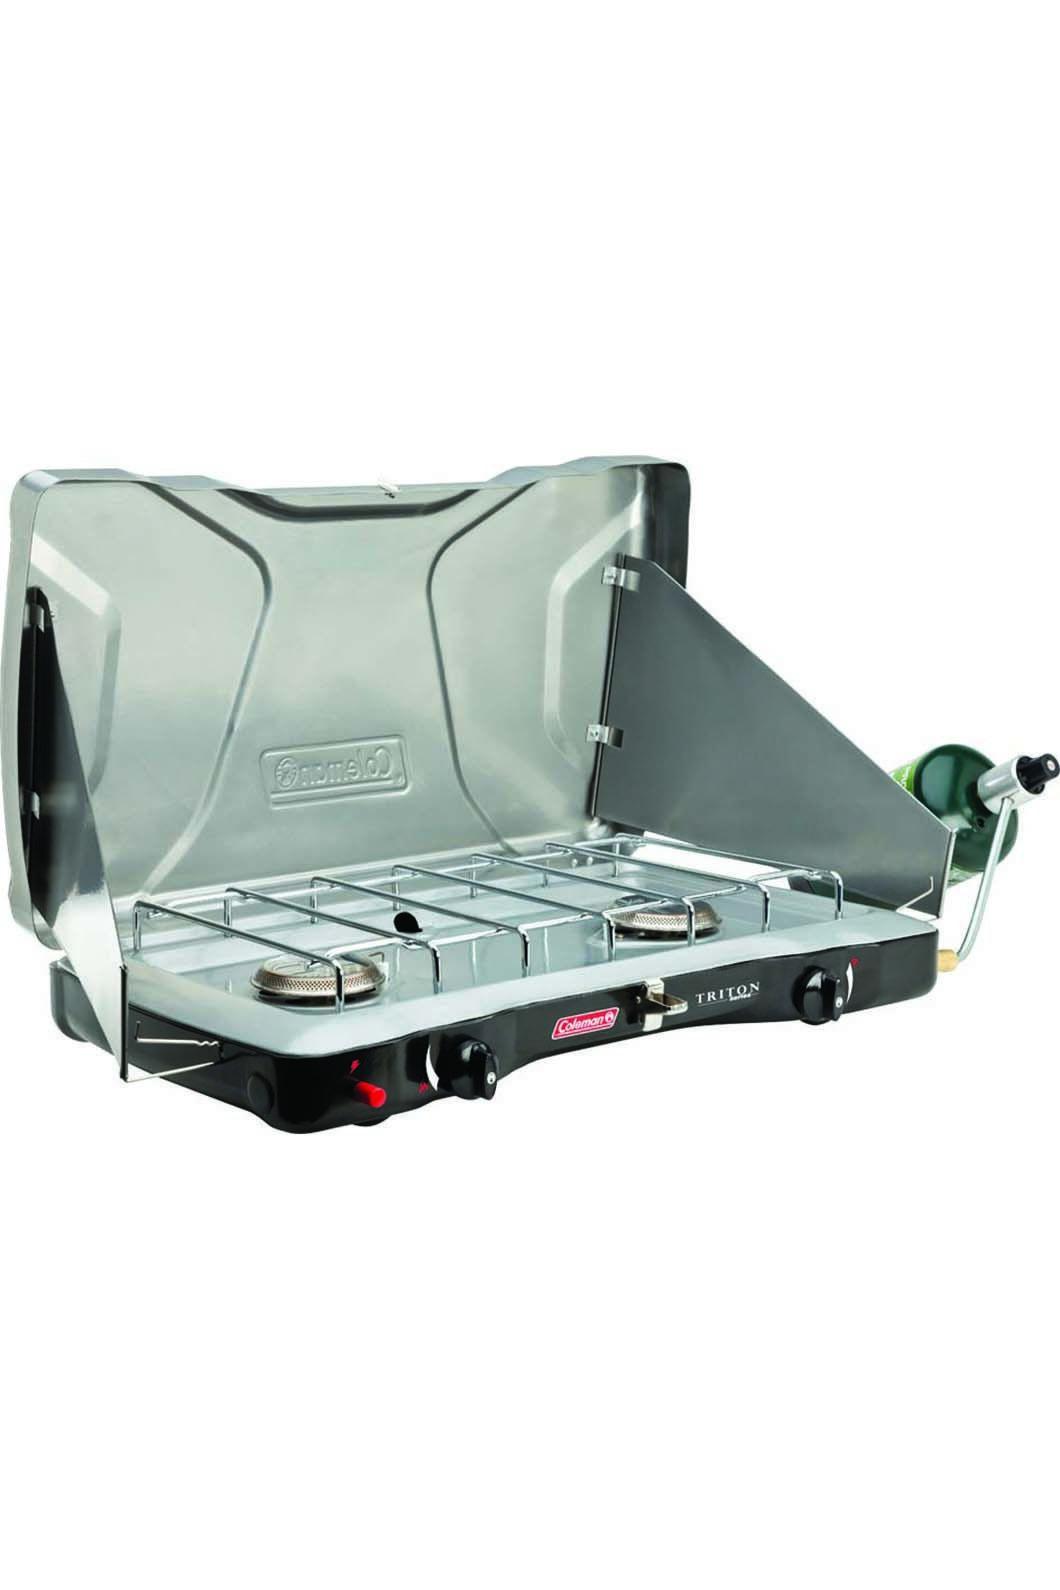 Coleman 2 Burner Triton Instastart Gas Portable Stove, None, hi-res